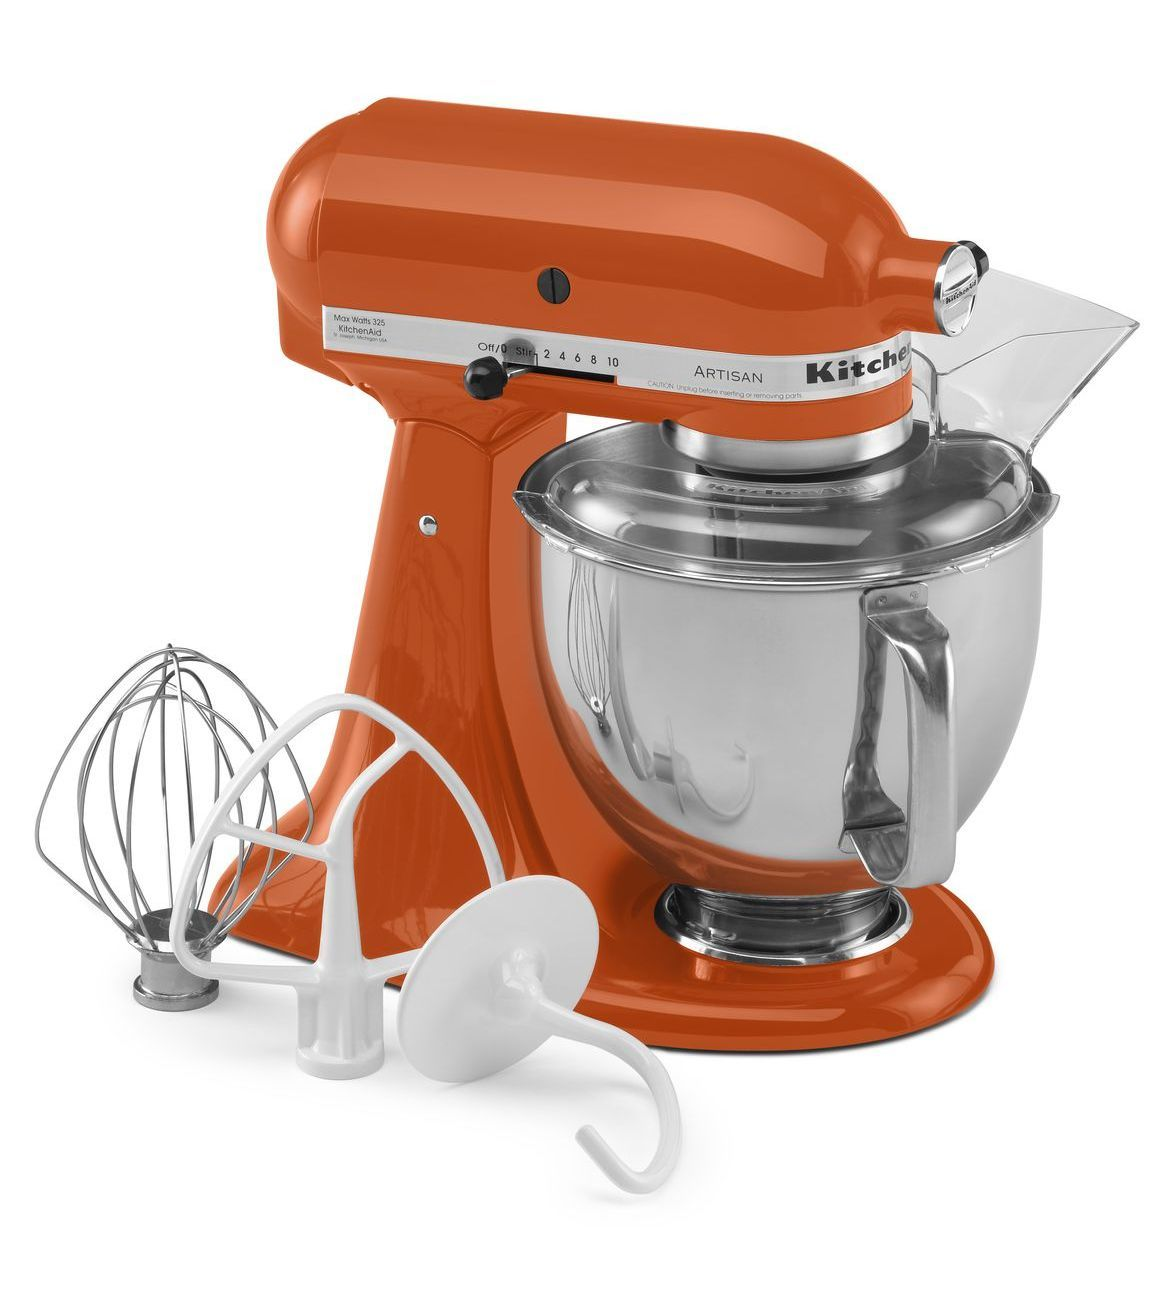 KitchenAid® Artisan® Series 5-Quart Tilt-Head.... persimmon color ...